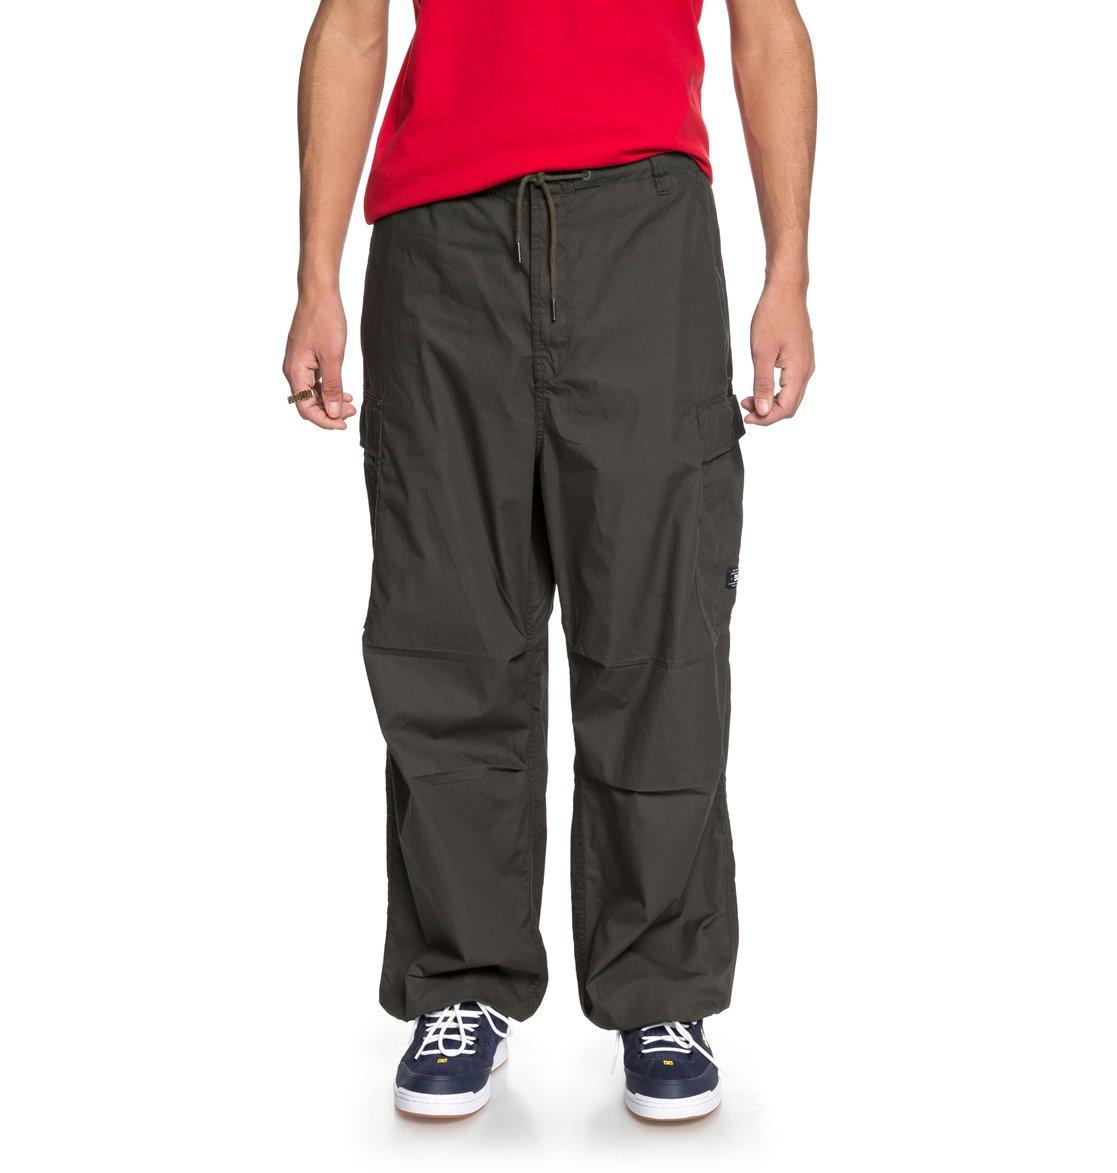 Trueper Parachute Pants Edynp03127 Dc Shoes